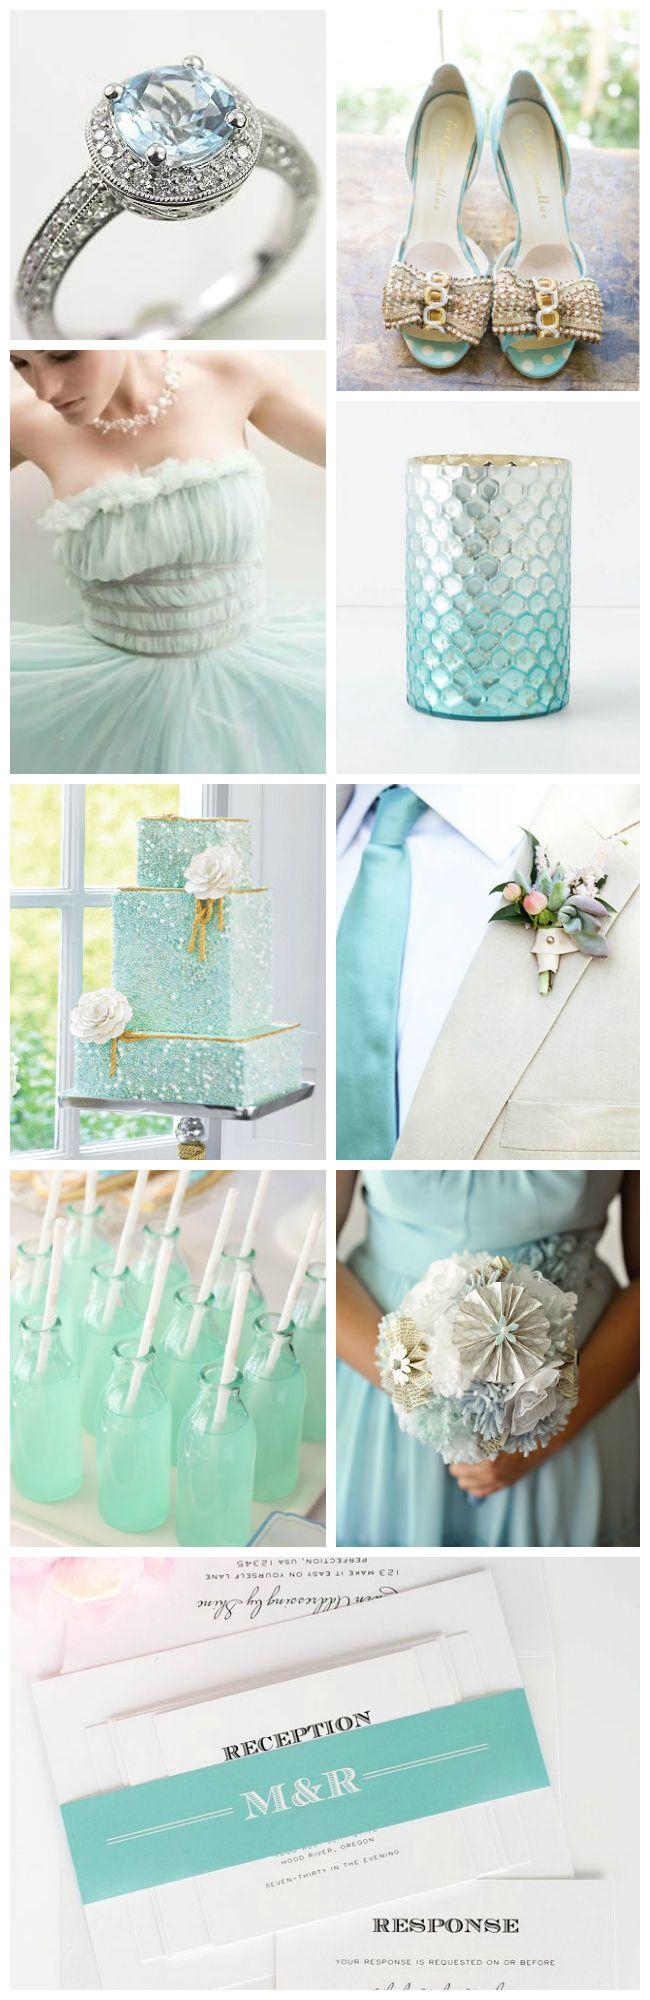 Aquamarine Wedding Inspiration | Pinterest | Aquamarines, Vintage ...